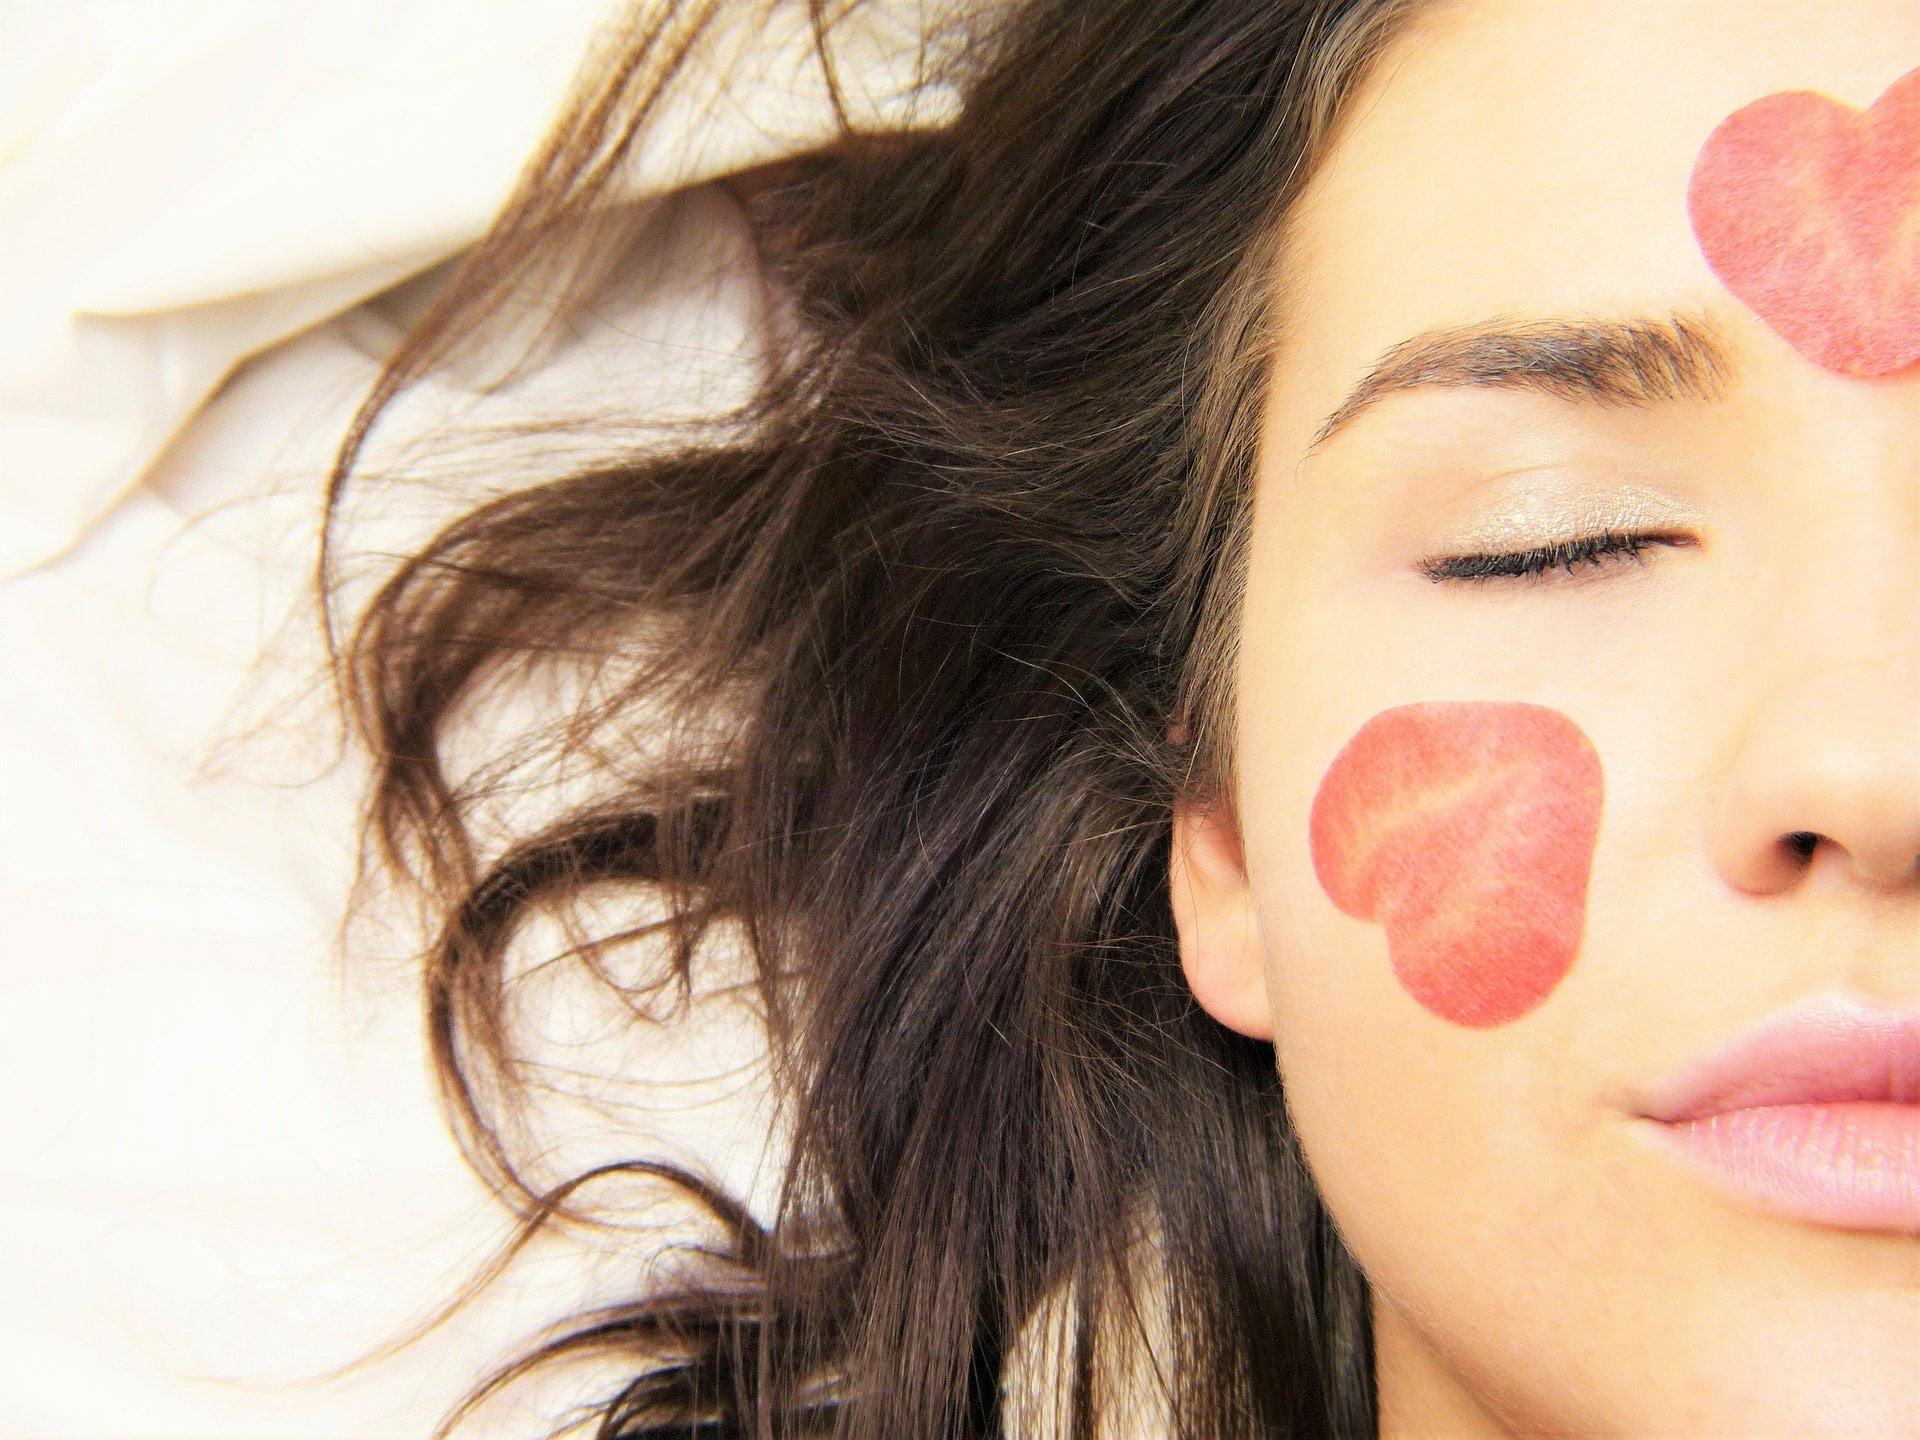 Keep Your Skin Moisturized to fix Crepey Skin